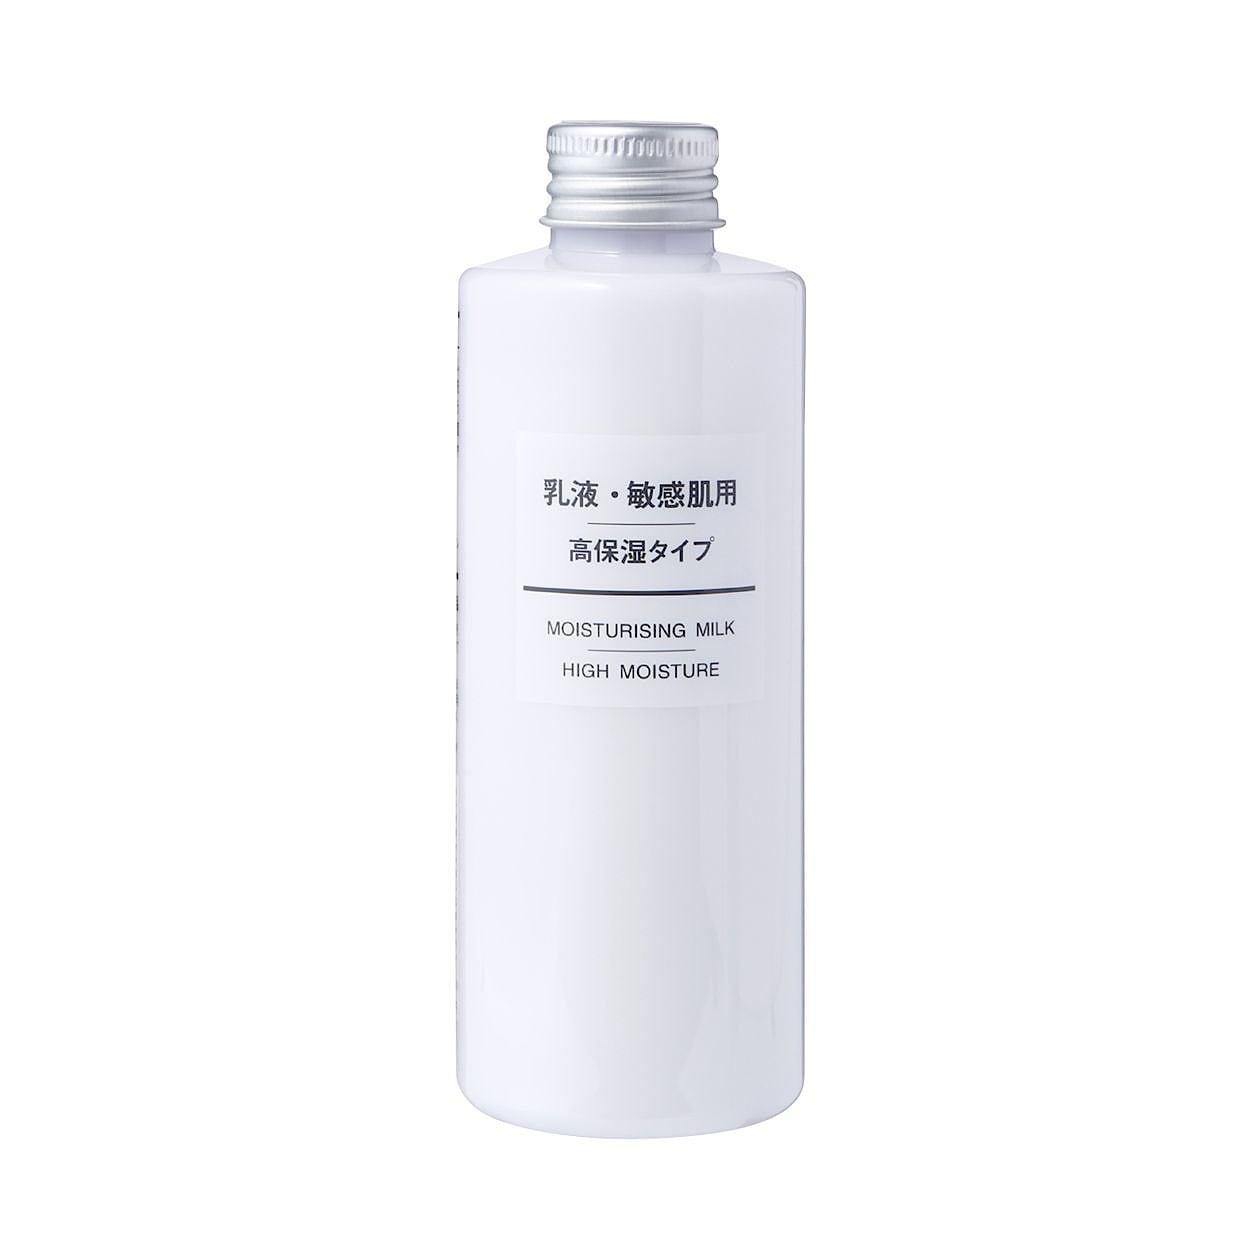 無印良品「乳液 敏感肌用 高保湿タイプ」